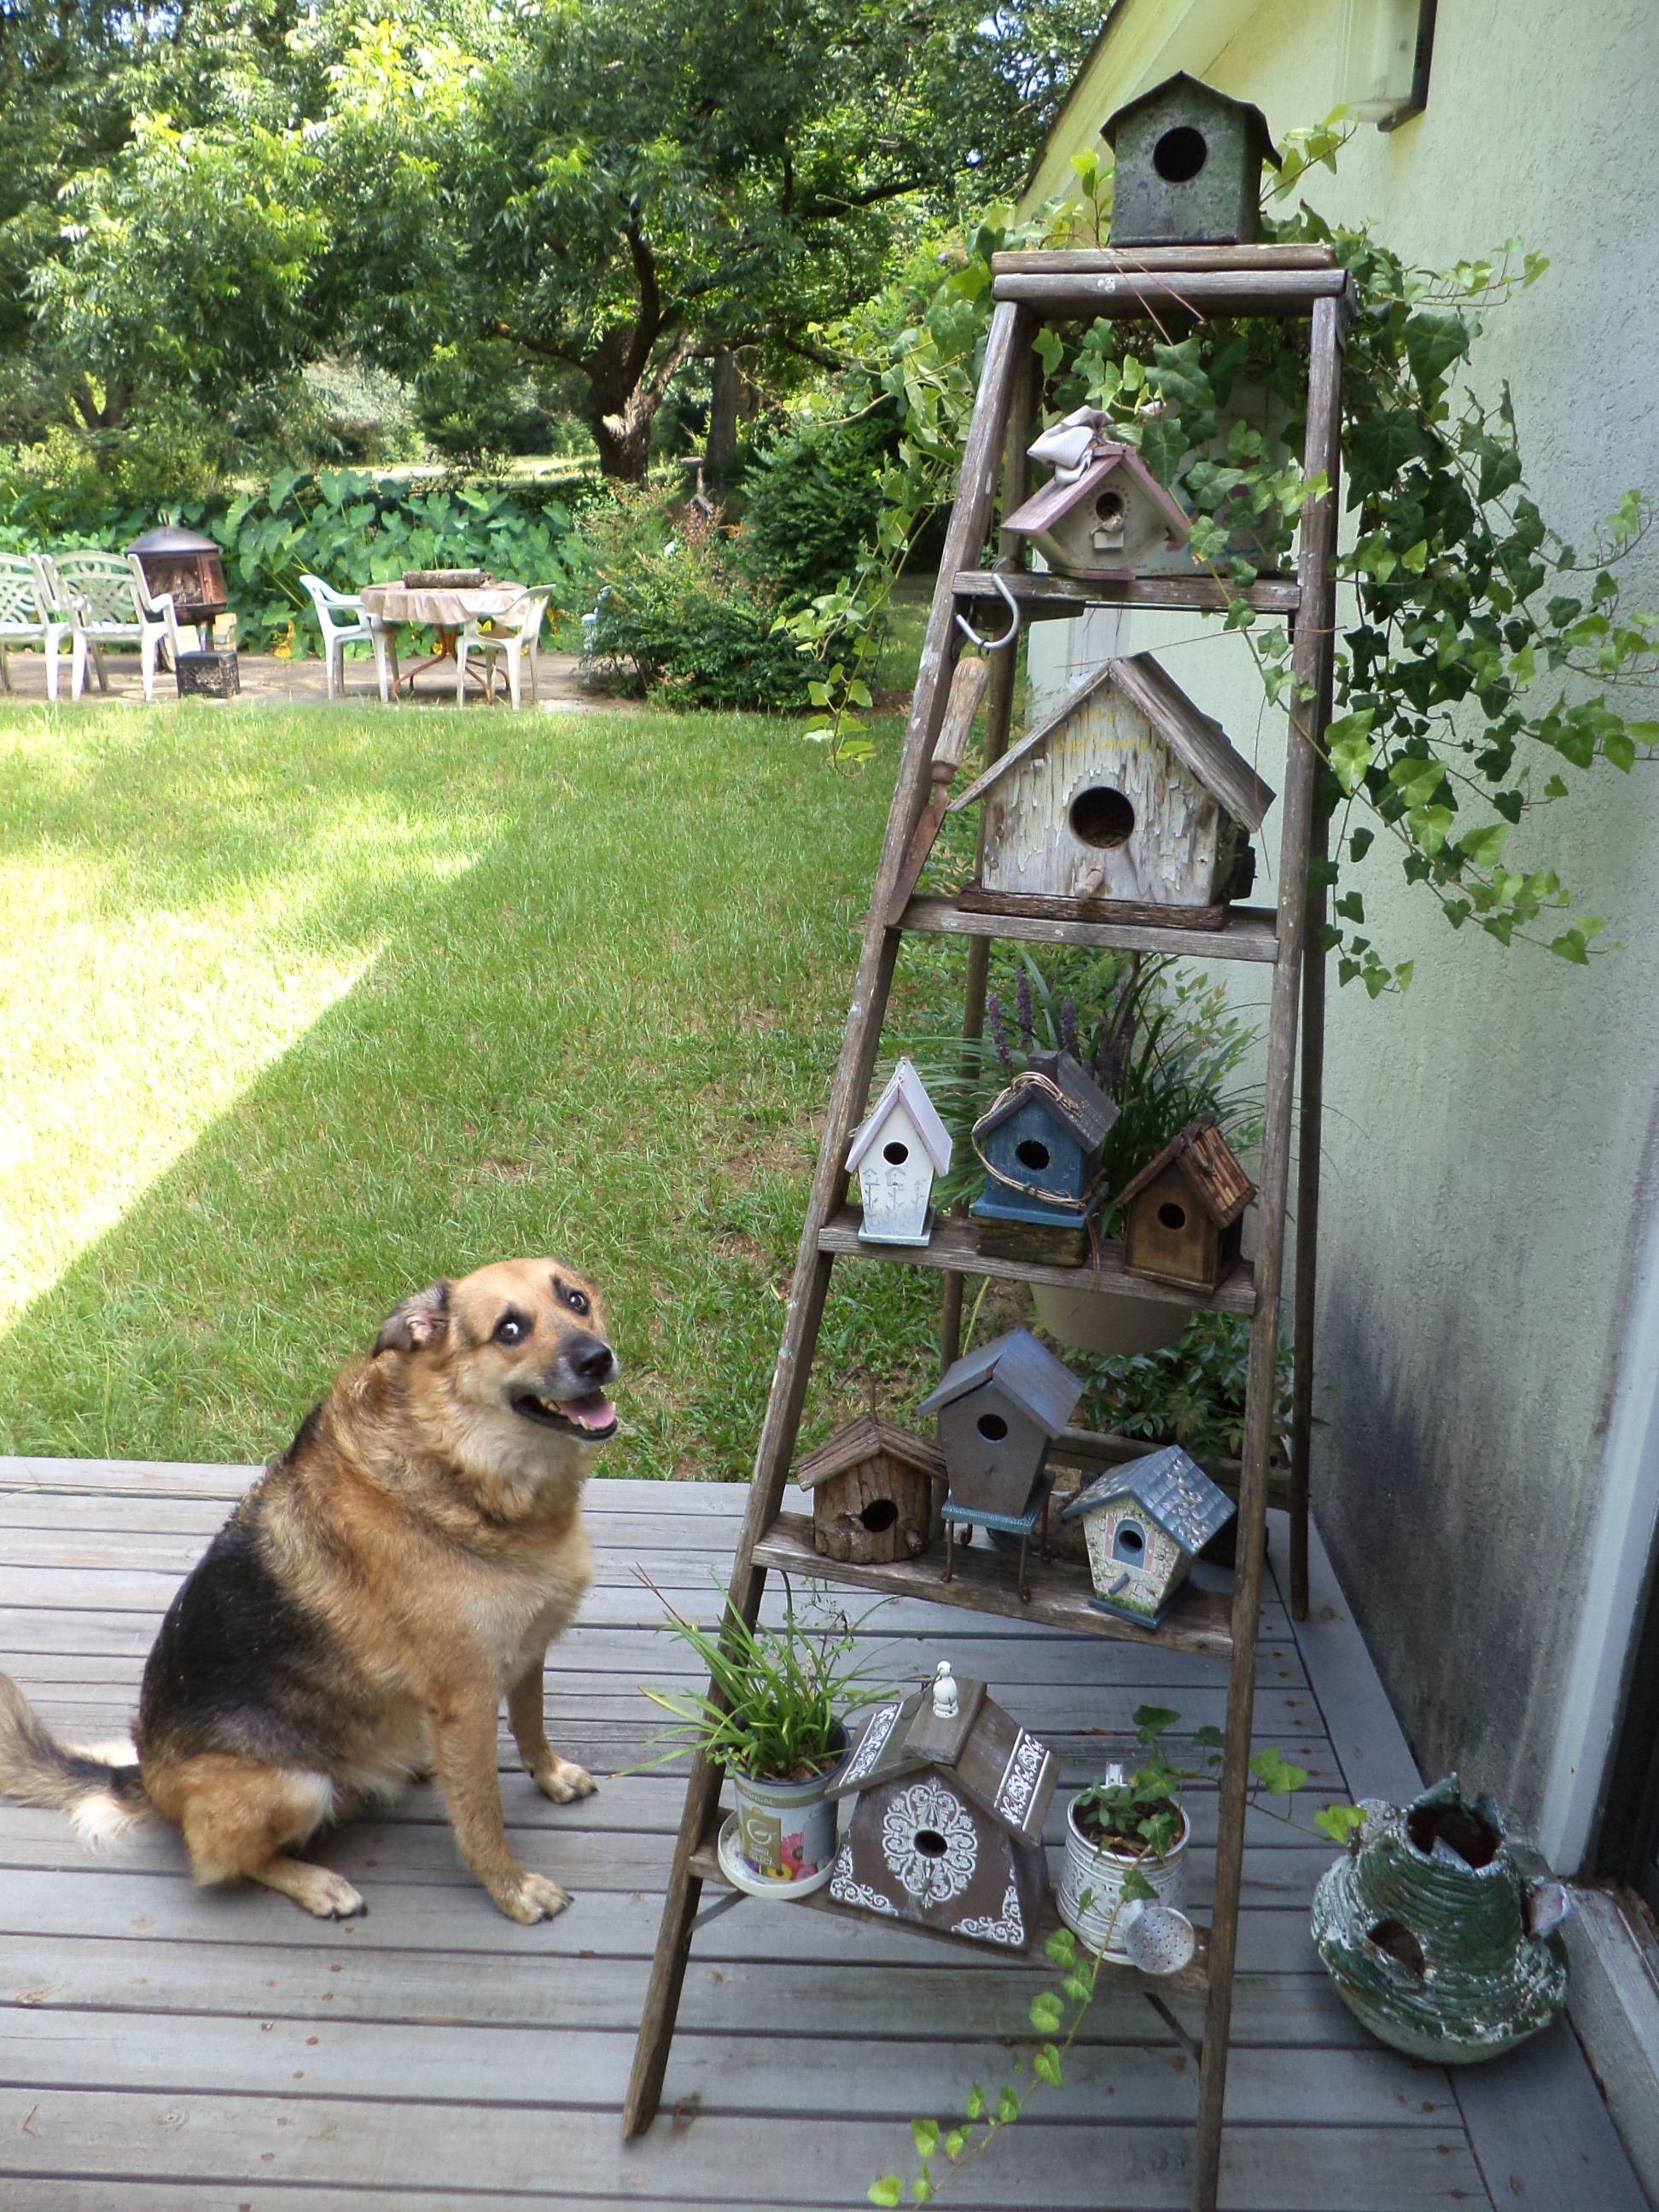 New birdhouses on daddyus old ladder ladders pinterest